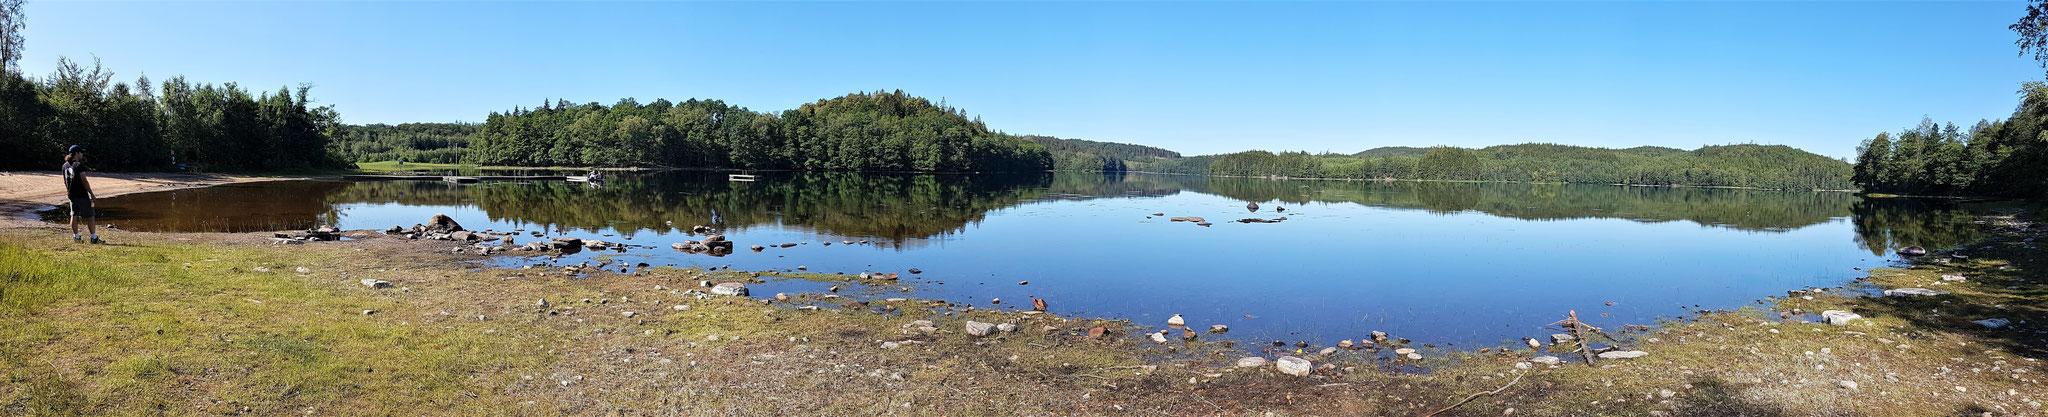 Schweden See Landscape overland Travel Camping #ProjektBlackwolf Skandinavien wolf78  explore without no limits roadtrip offroad Overlandingnomads Overlandbound wolf78-overland.ch